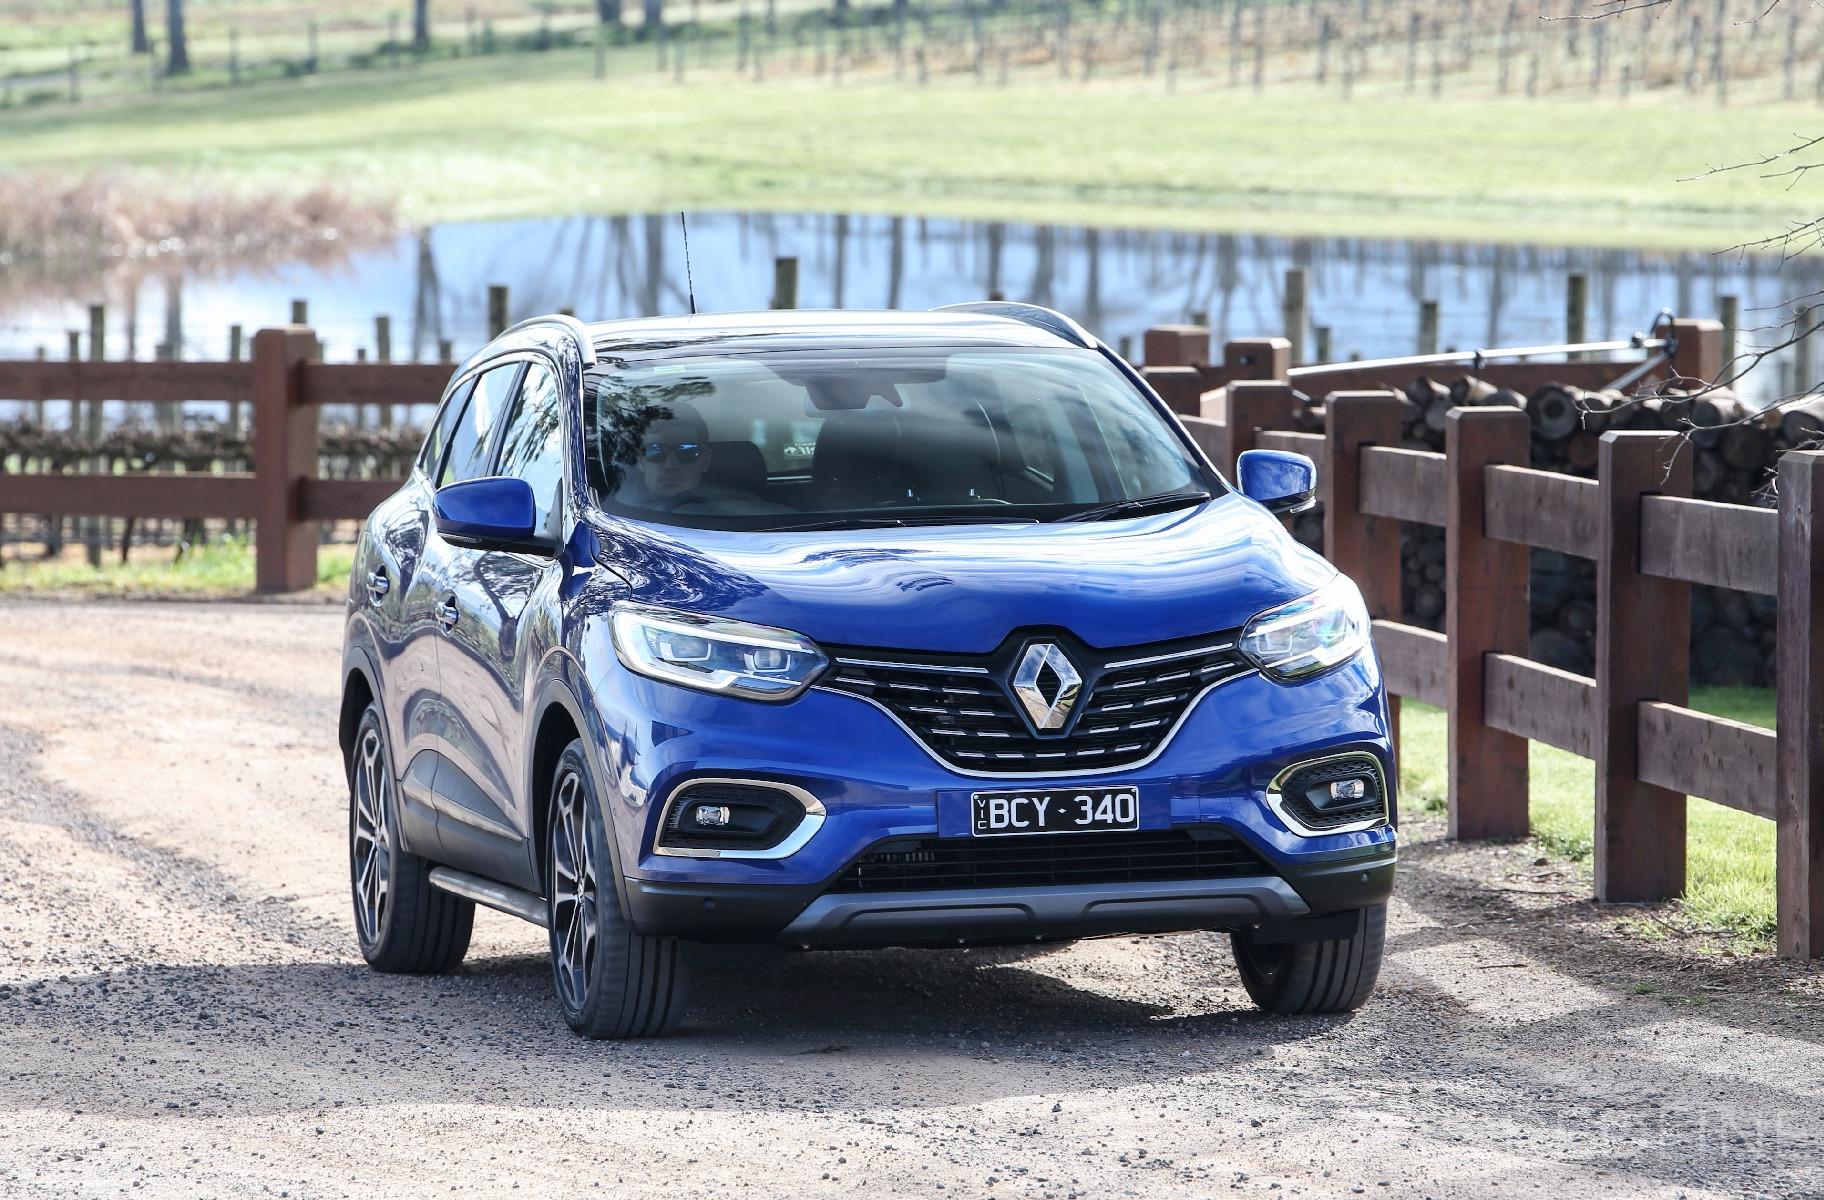 2020 Renault Kadjar Intens Review - theredline.com